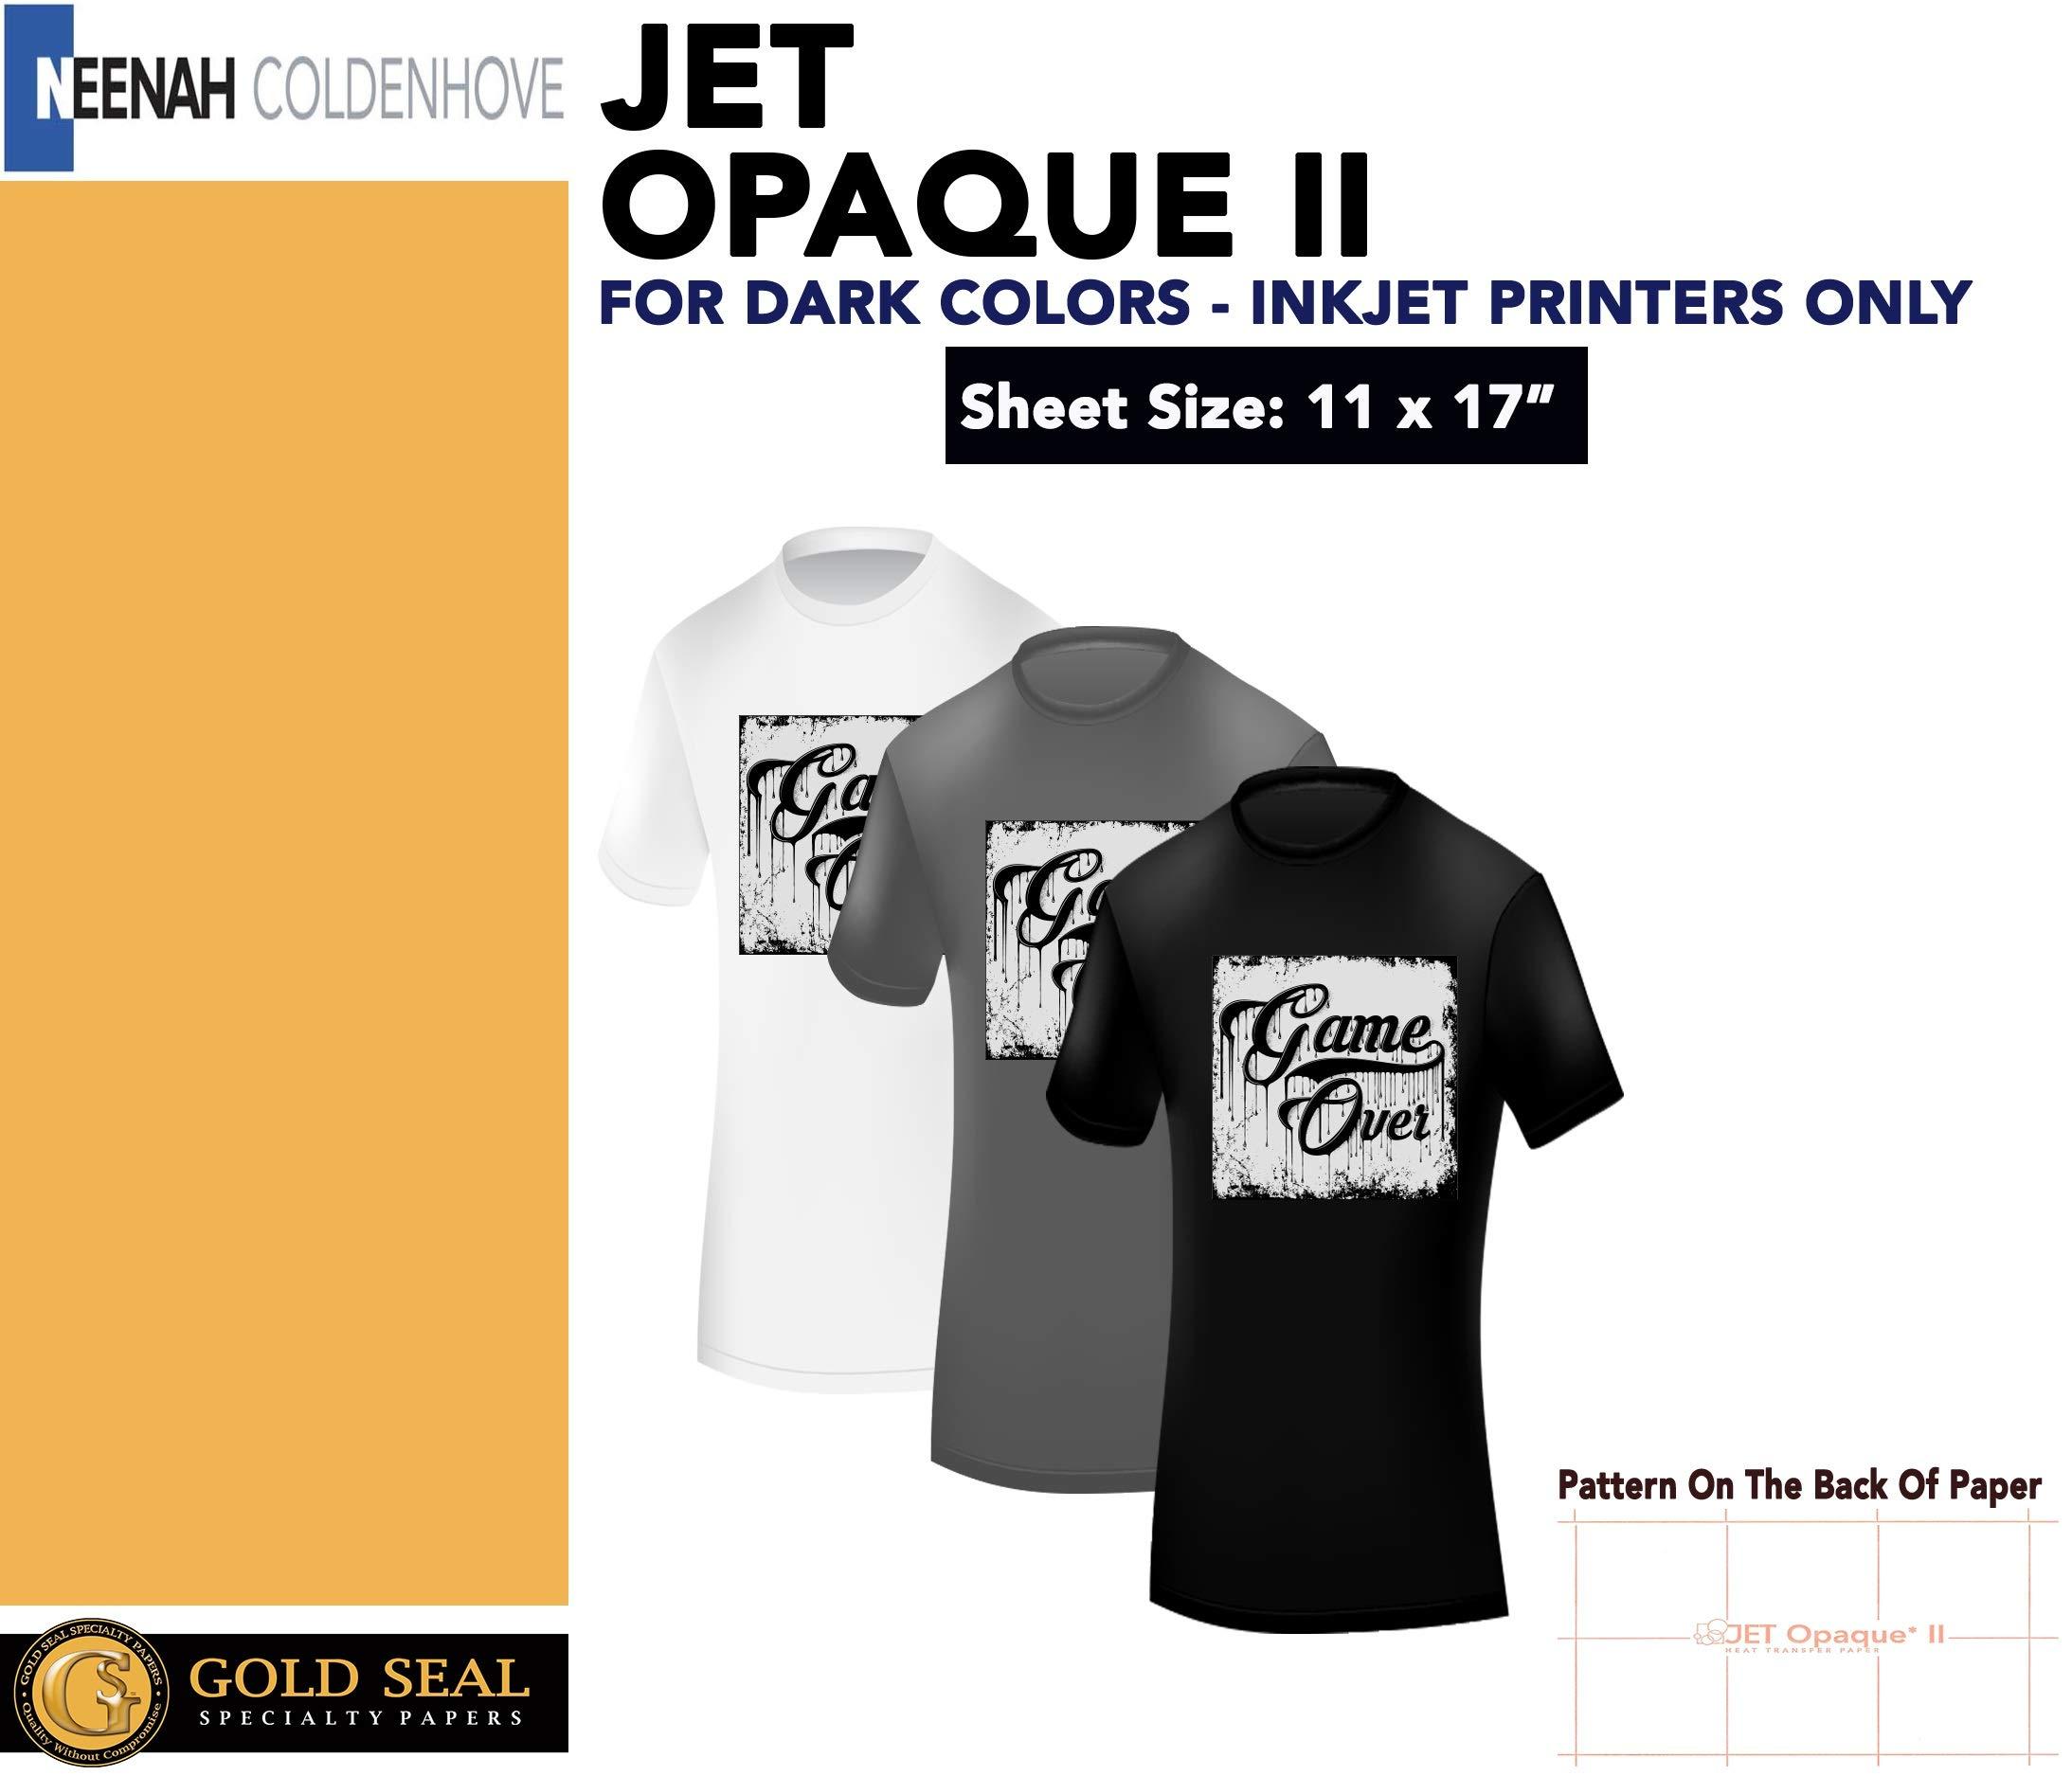 JET-OPAQUE II HEAT TRANSFER PAPER 11 x 17'' CUSTOM PACK 100 SHEETS by NEENAH PAPER; JET-PRO SS; JETPRO SOFSTRETCH